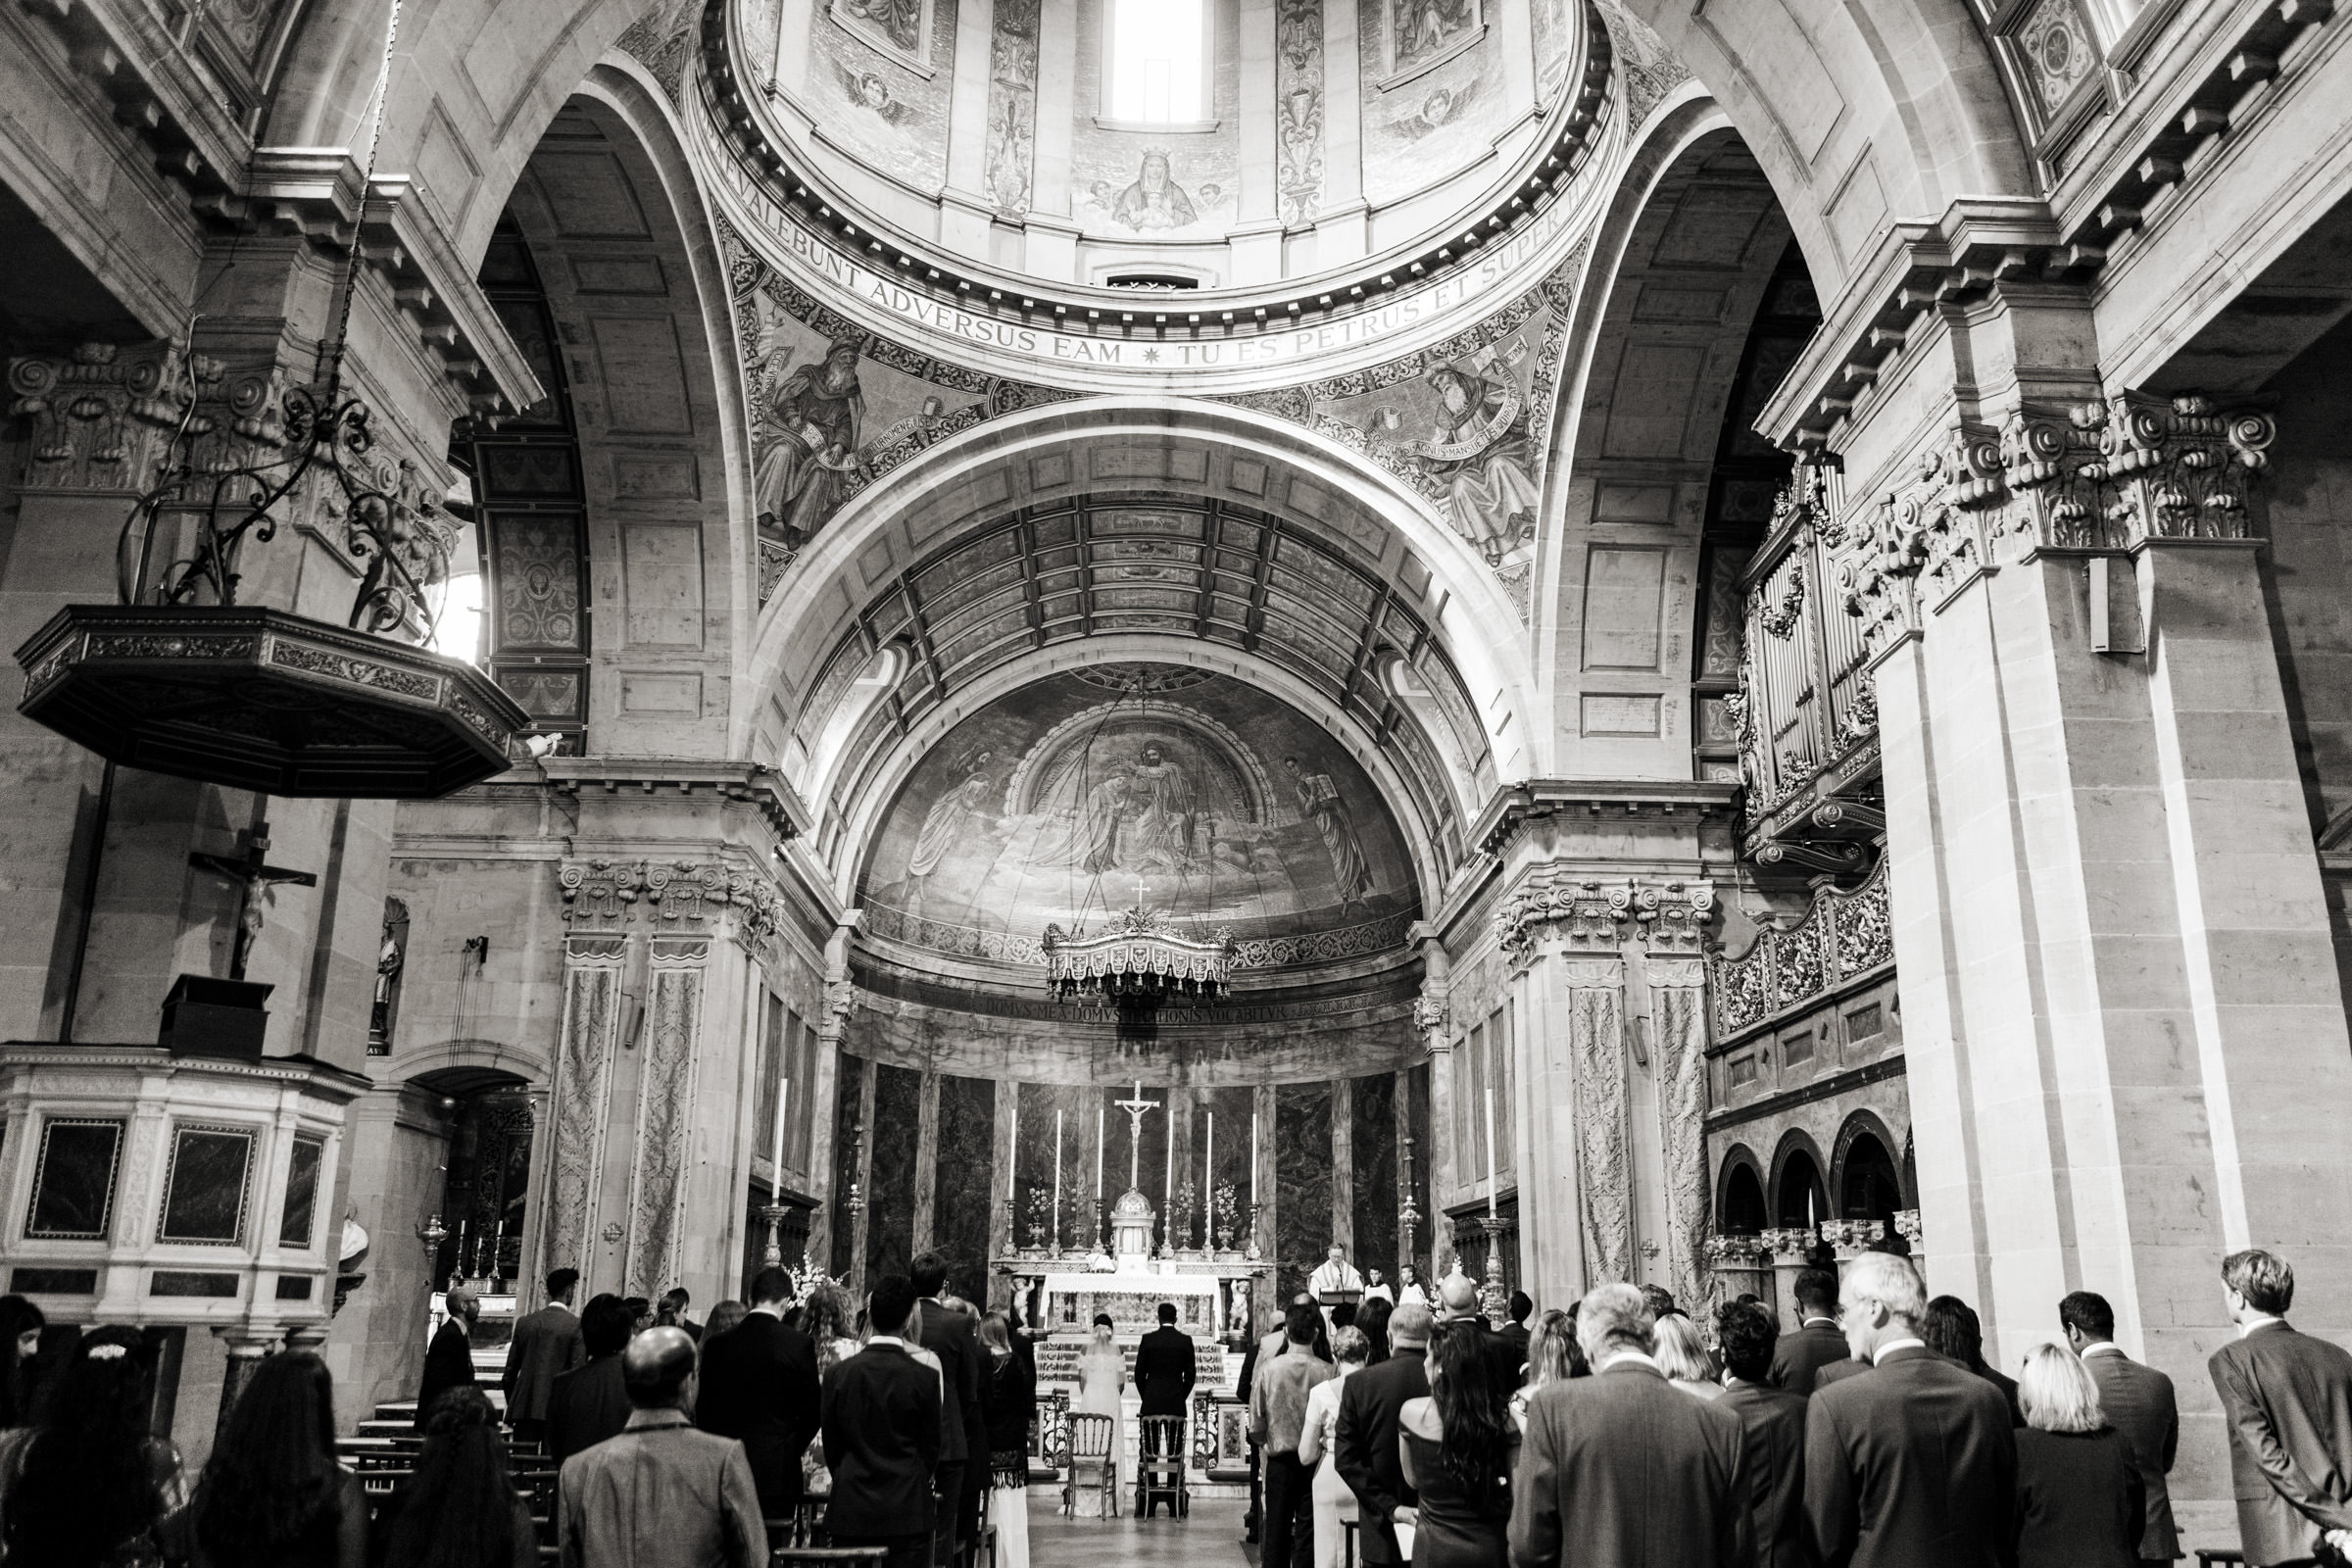 The Oratory of Saint Phillip Neri Birmingham Wedding Photography 009.jpg